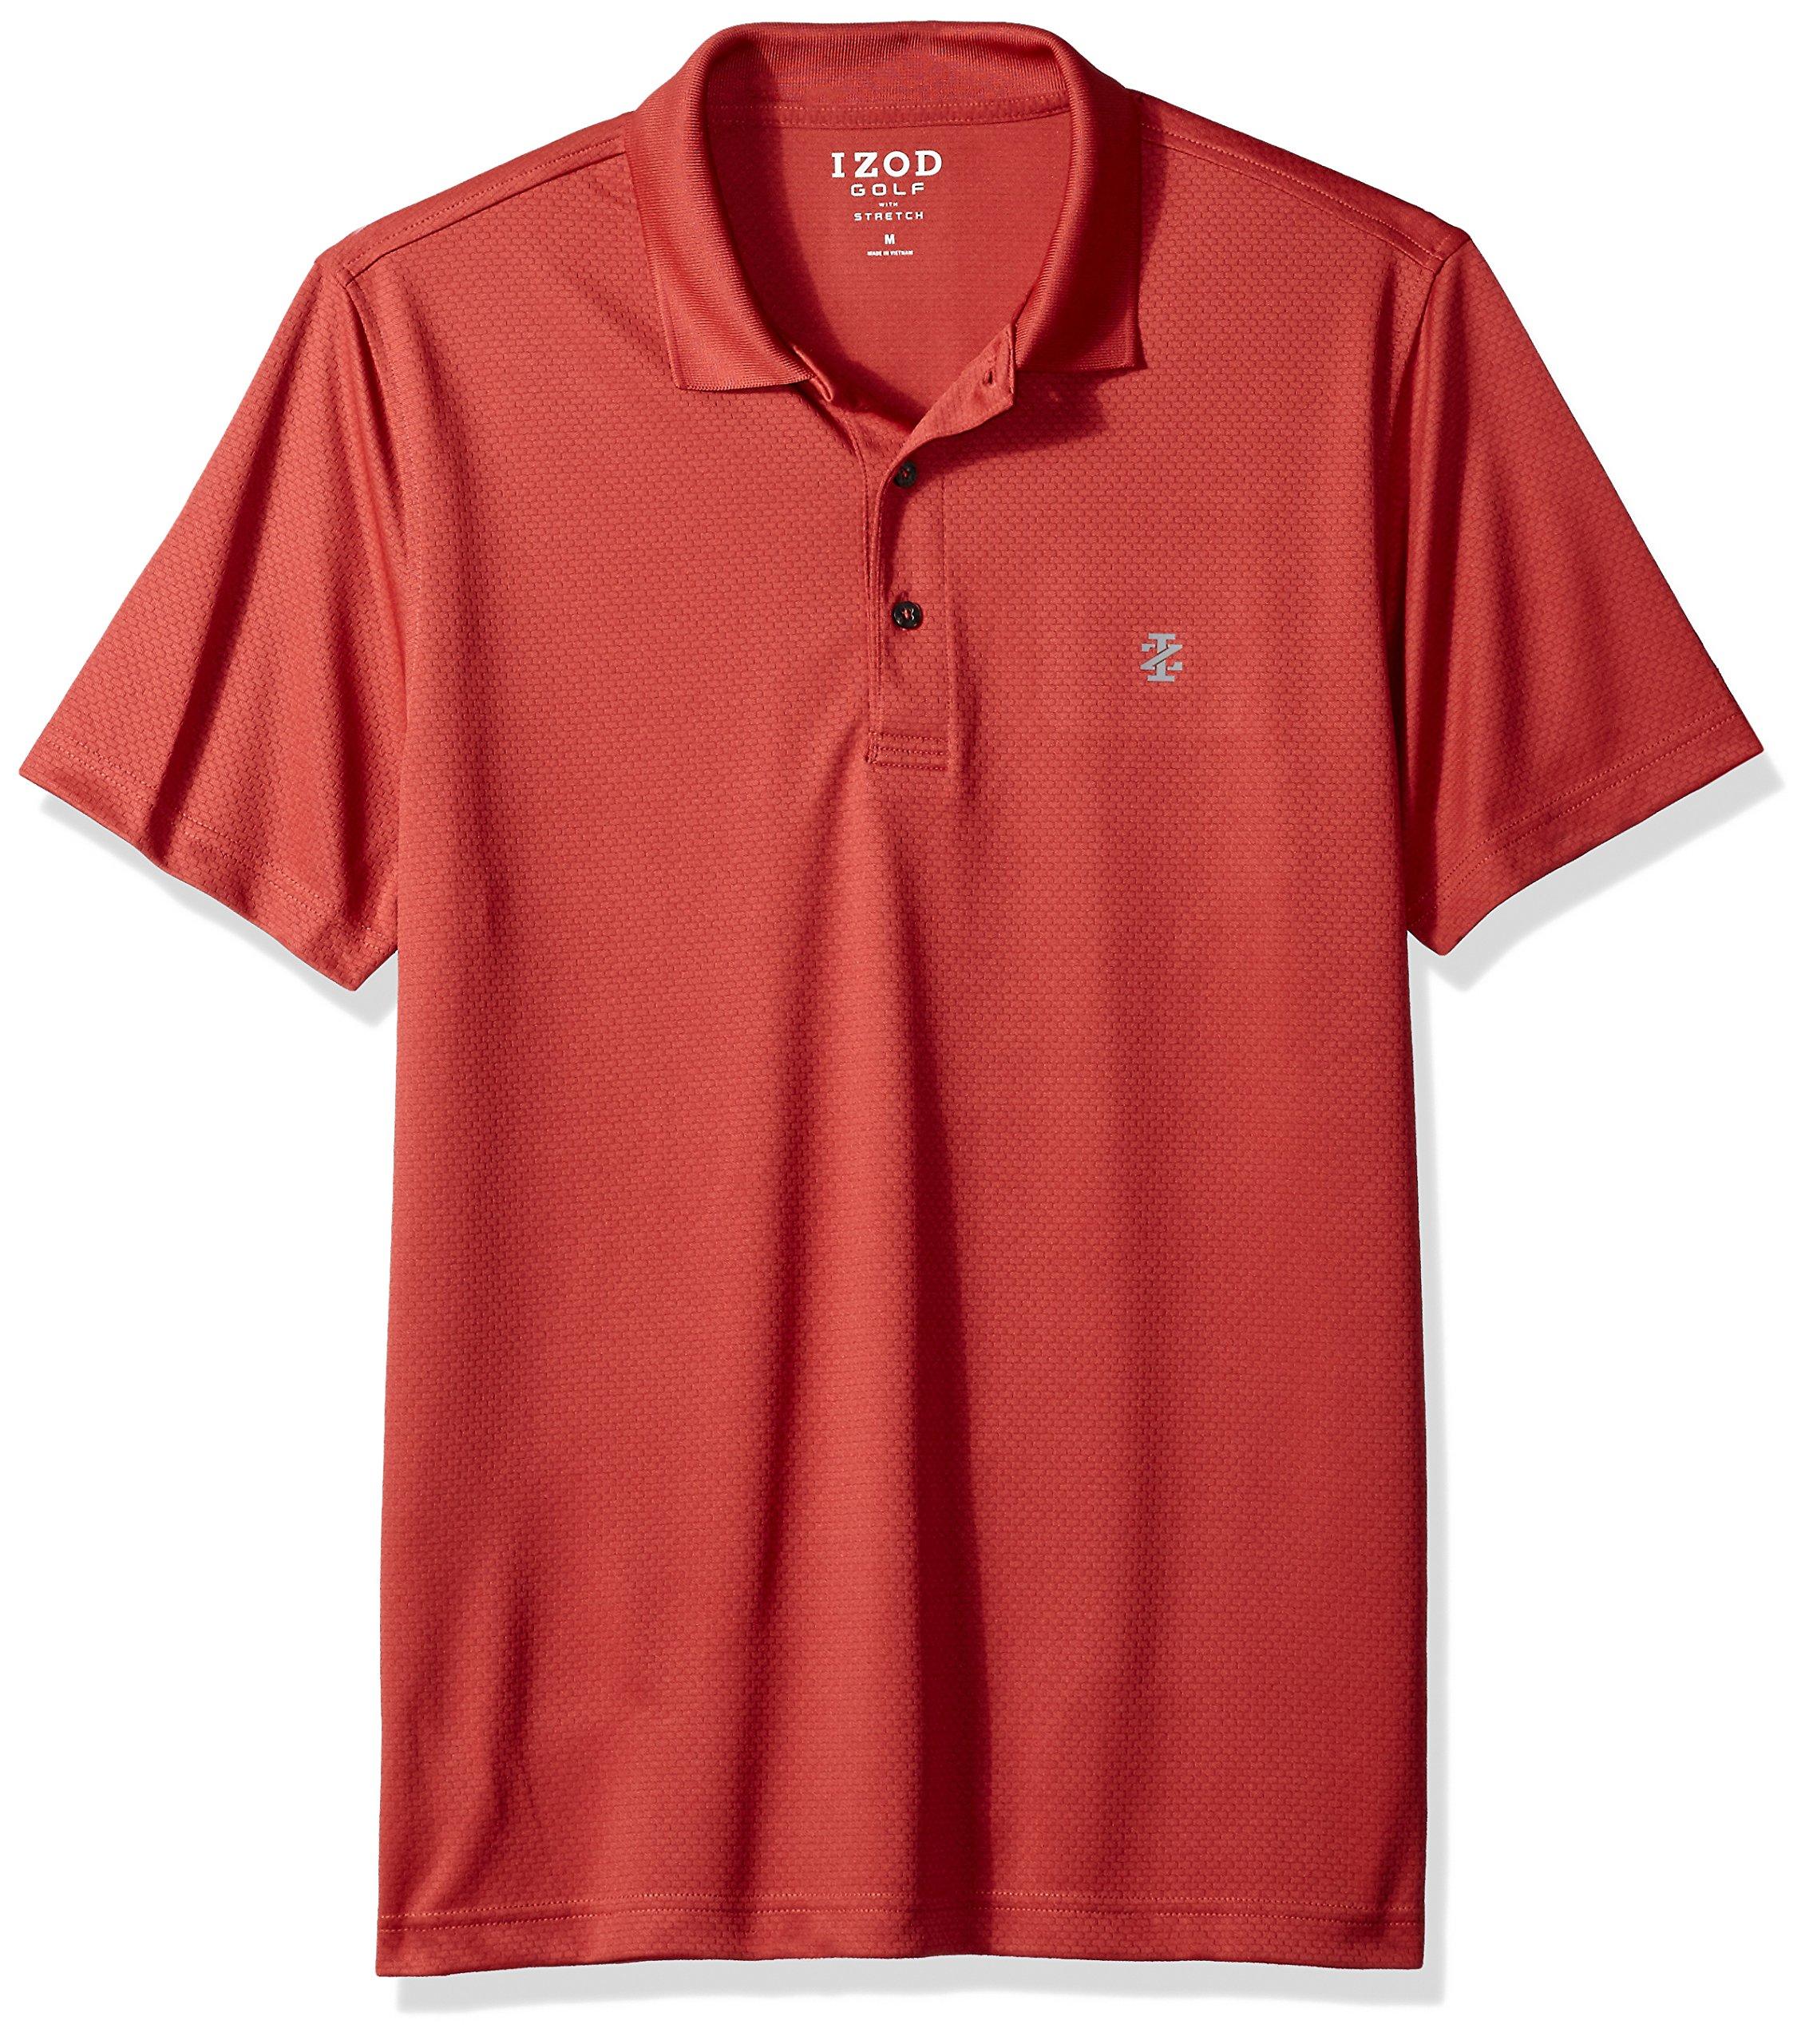 IZOD Men's Golf Title Holder Short Sleeve Polo, Saltwater red, XL